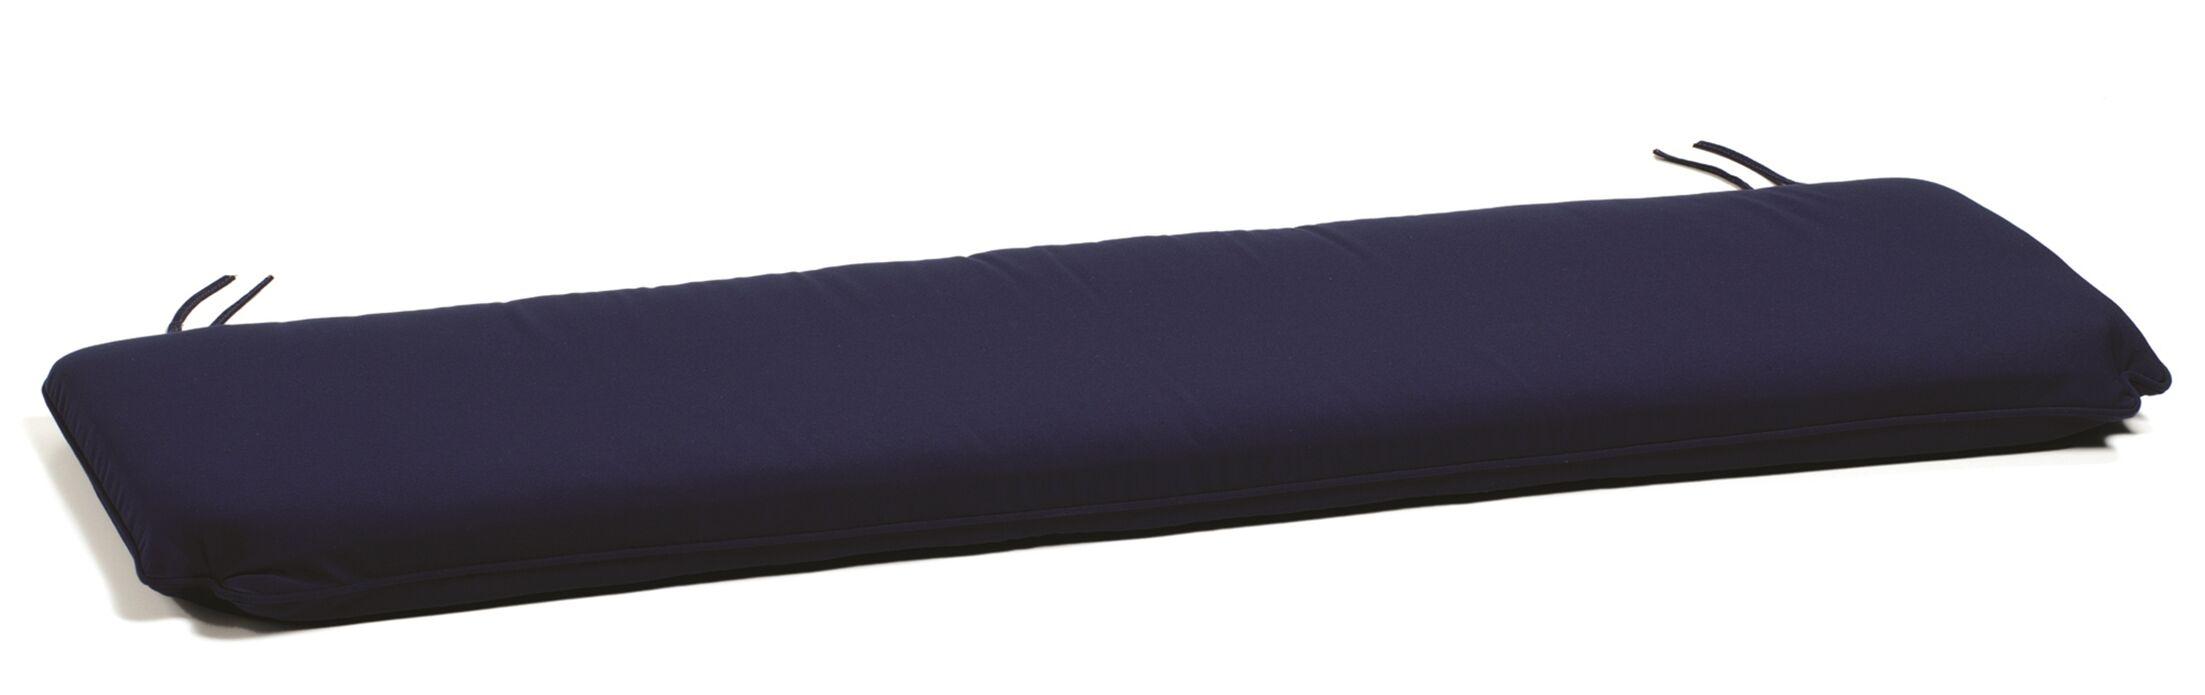 Indoor/Outdoor Bench Cushion Cushion Color: Dupione Walnut, Cushion Size: 72